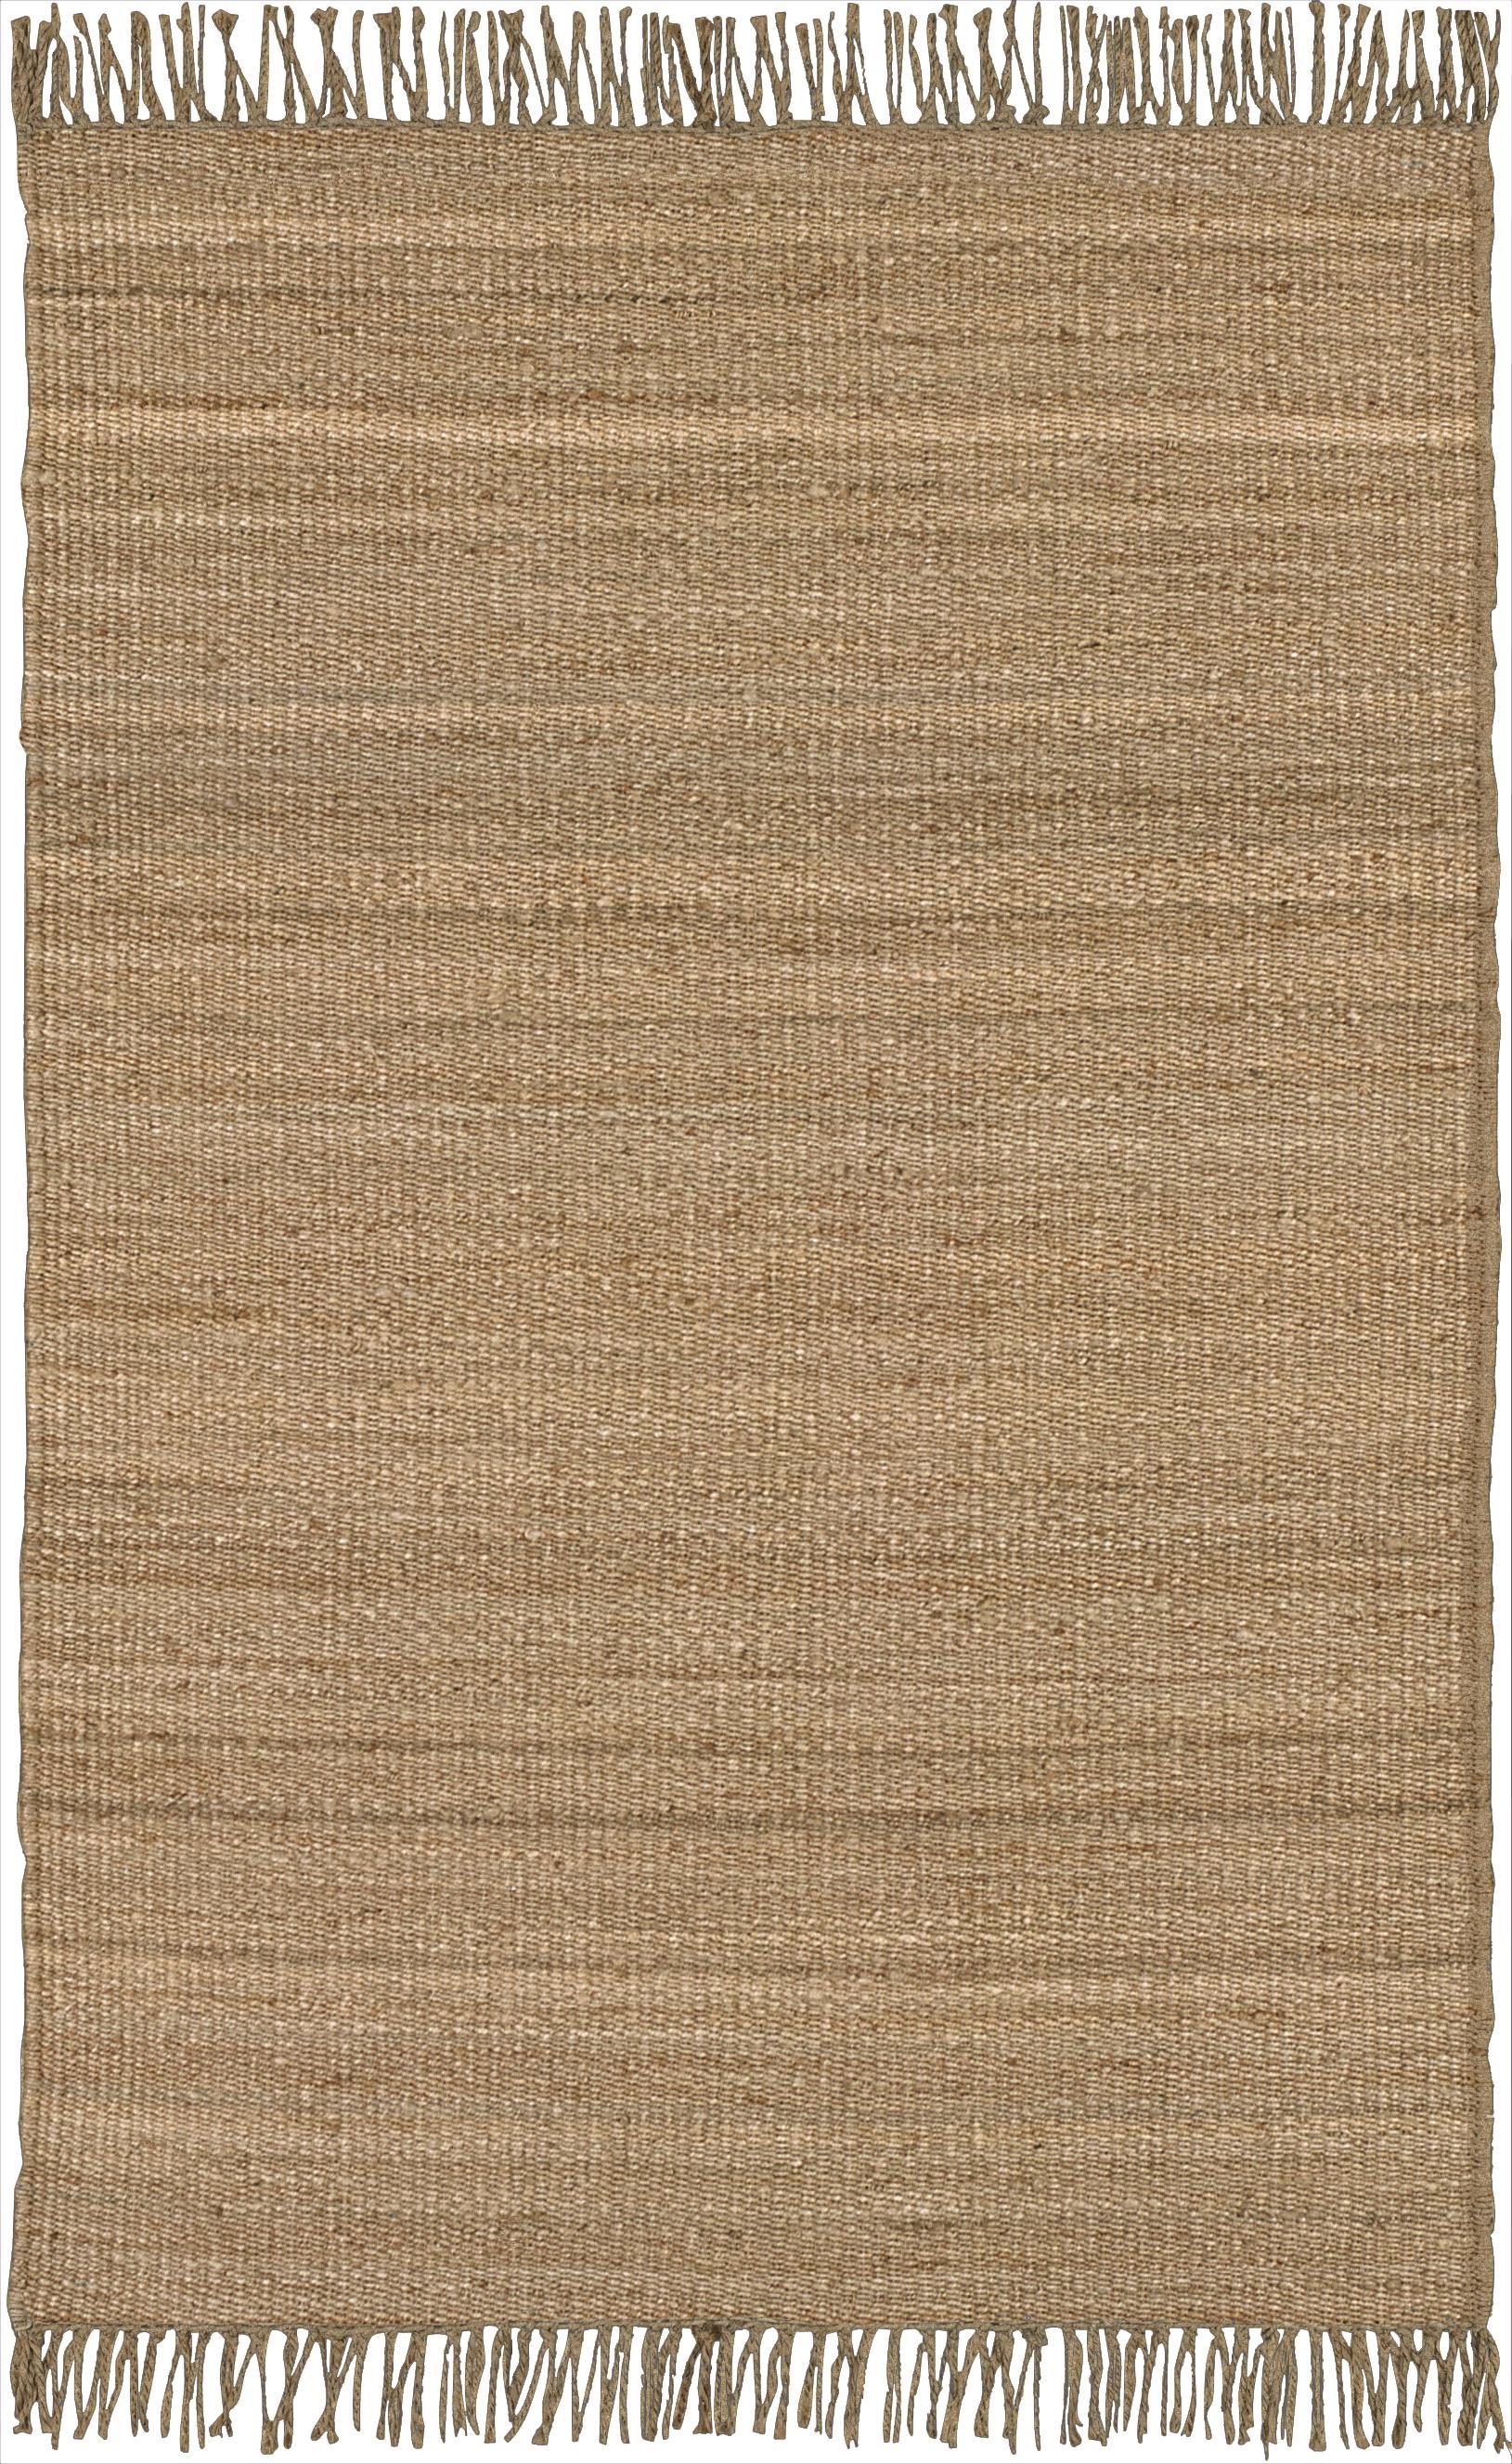 Jute Natural 8' x 11' by 9596 at Becker Furniture